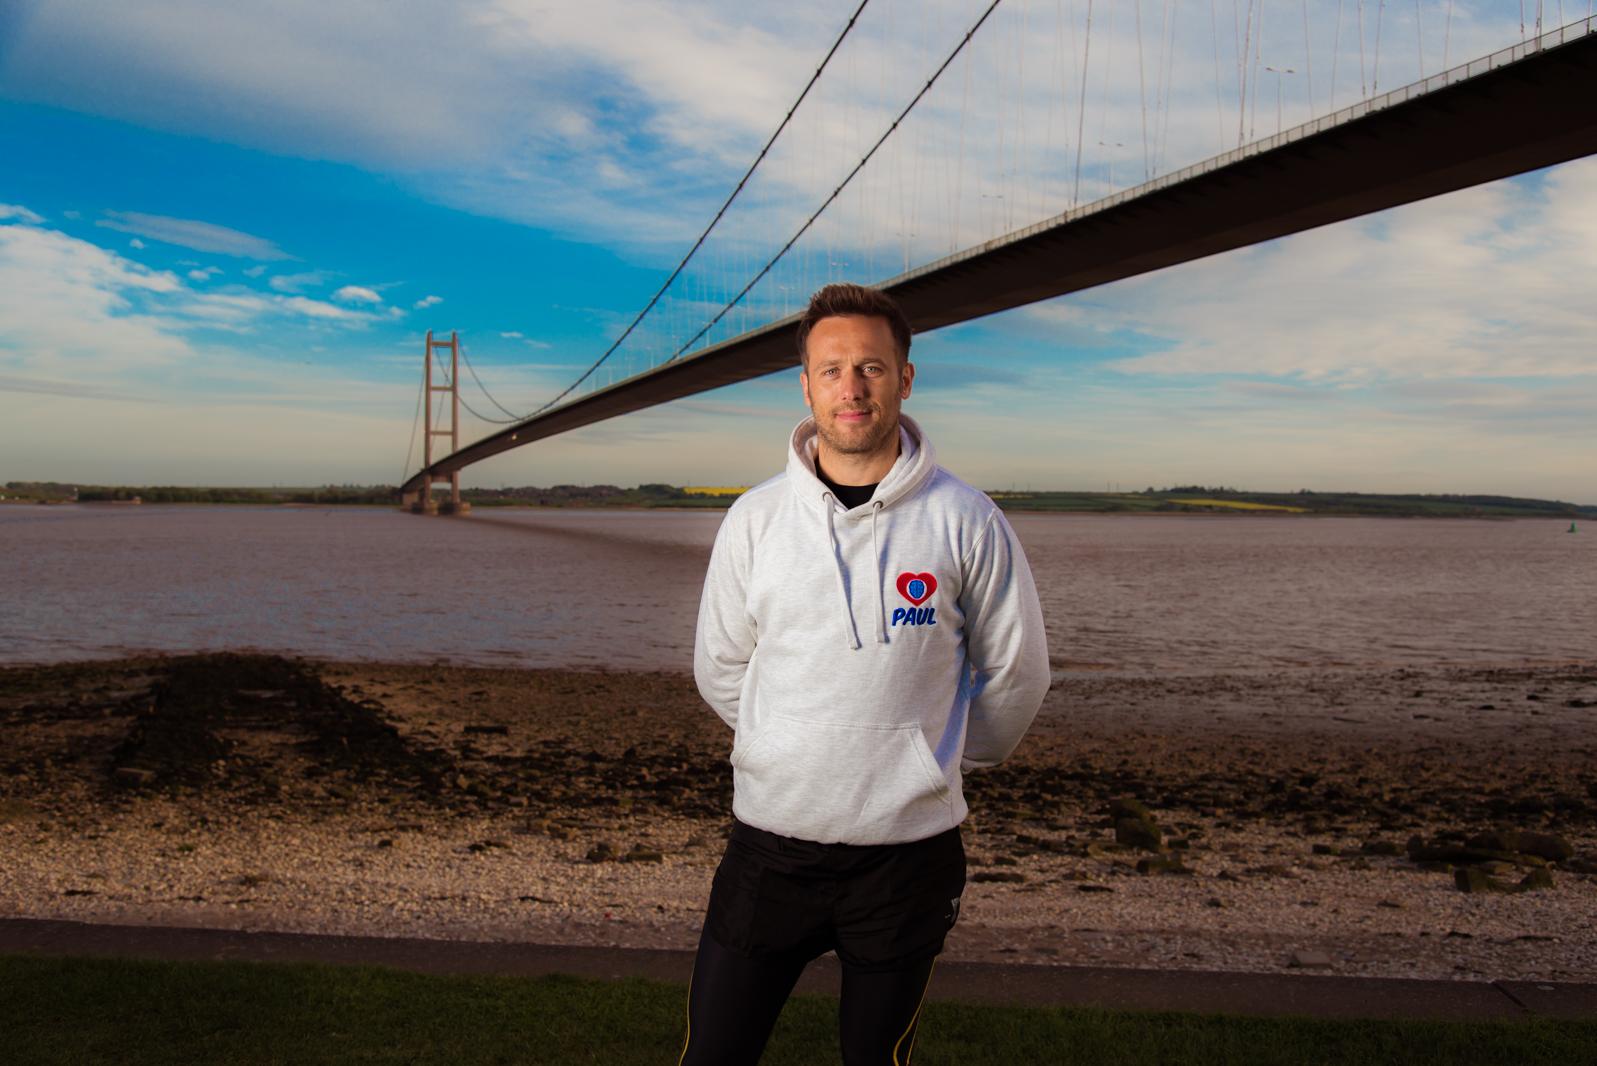 Brain injury victim Paul Spence to run four marathons in four days around coast of Ibiza